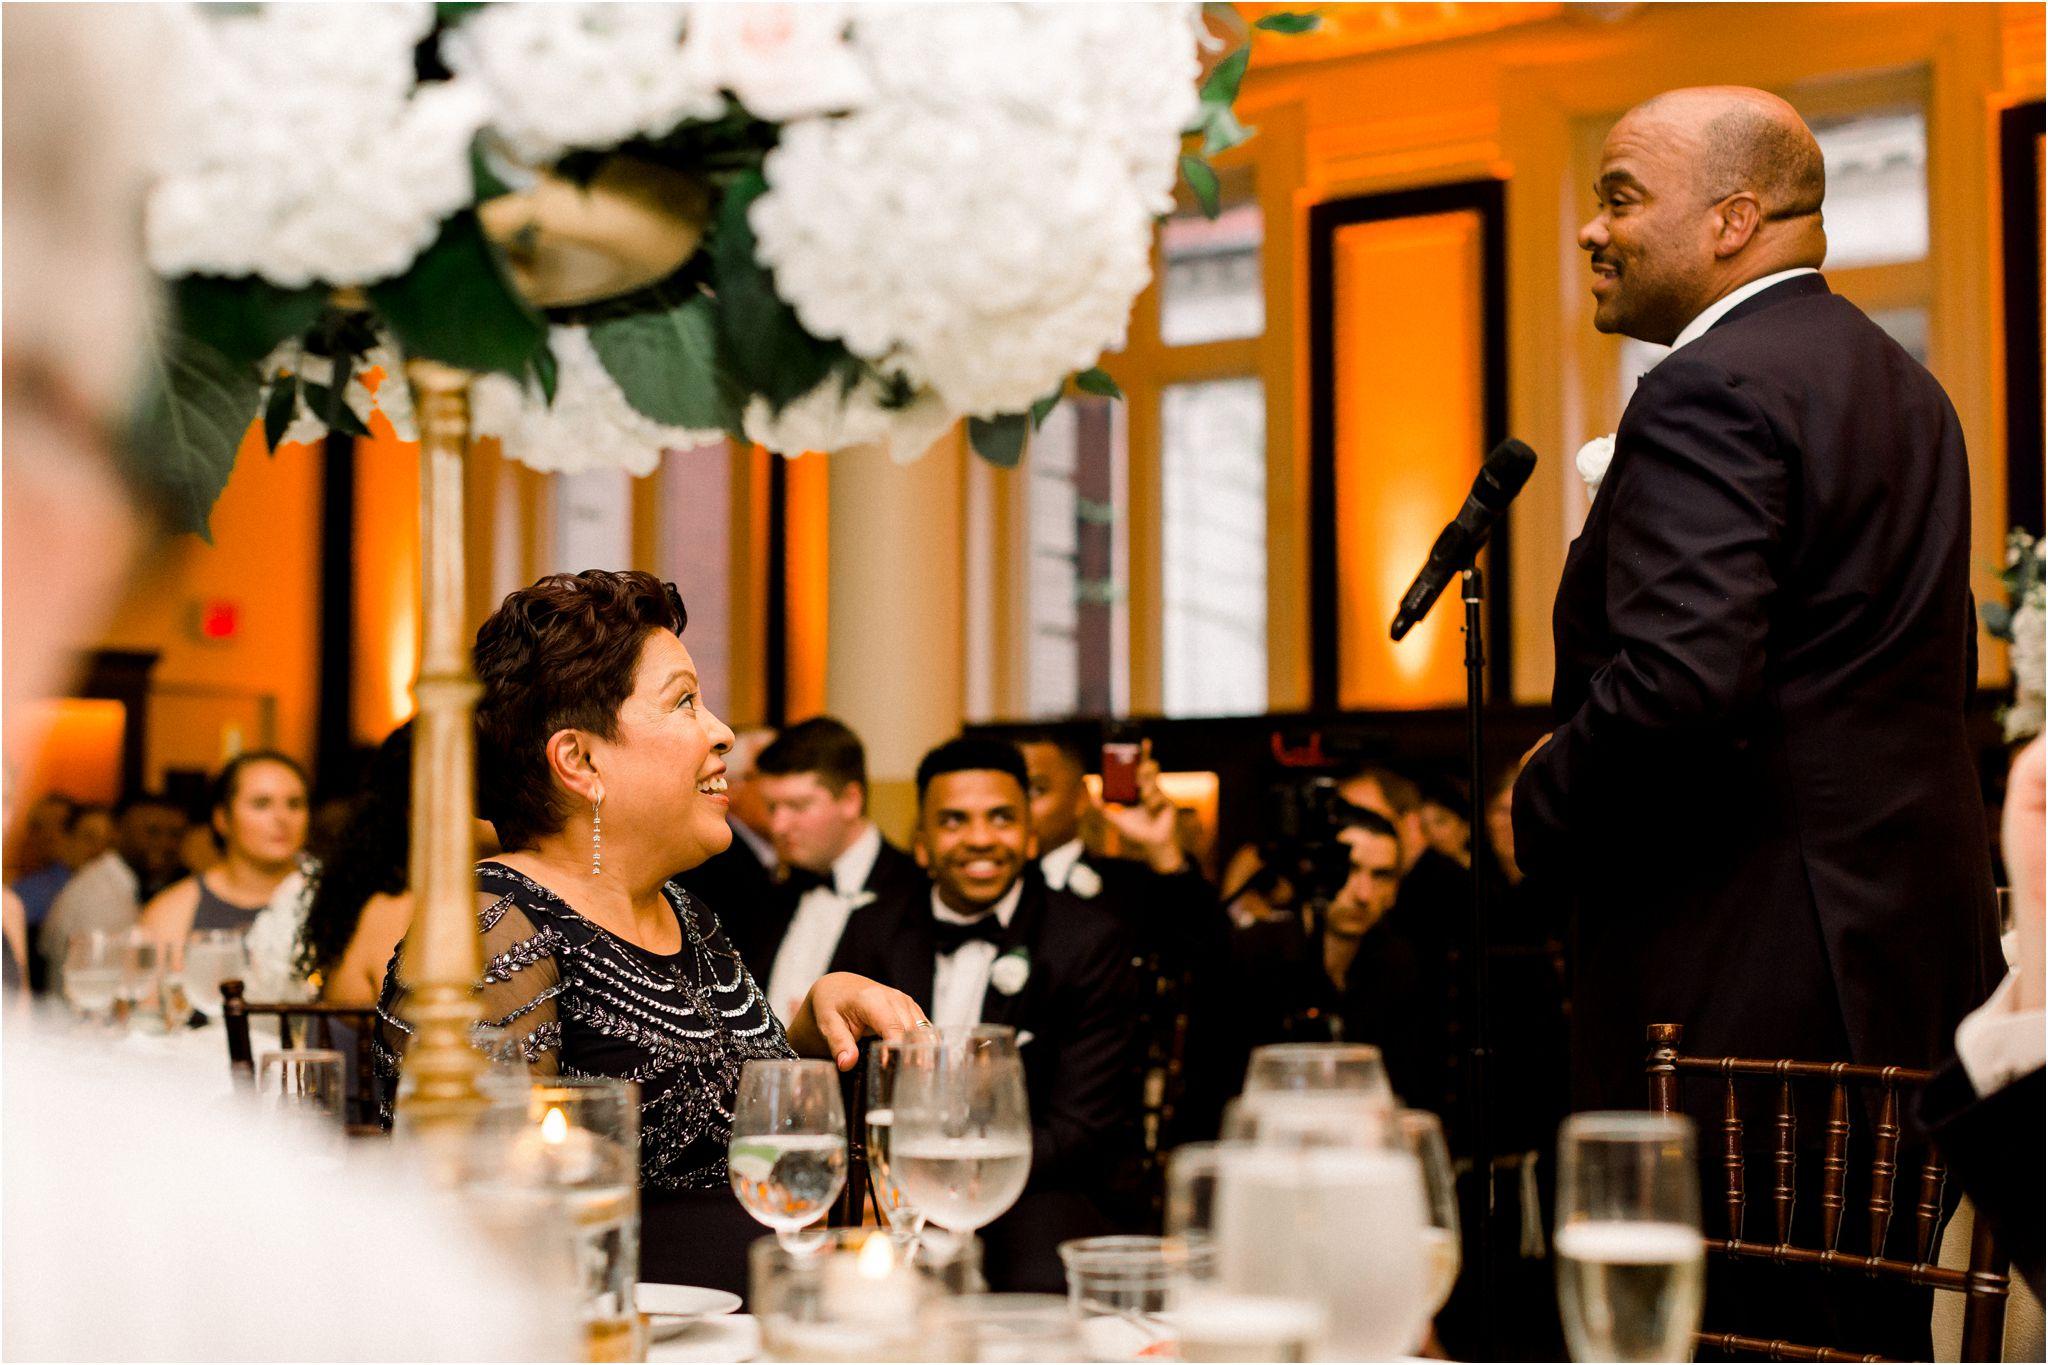 providence-public-library-wedding-images_00044.JPG